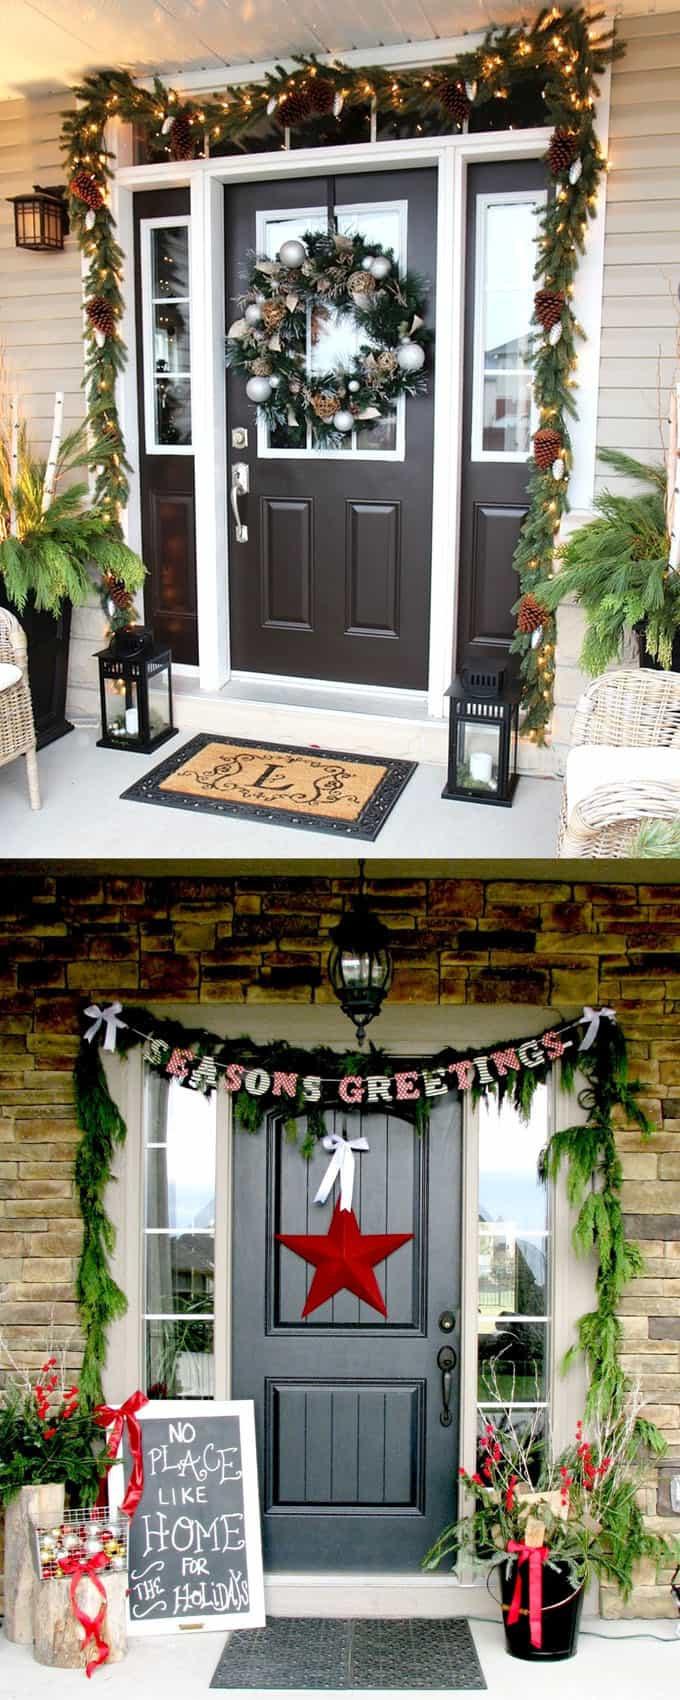 DIY Outdoor Christmas Decorating Ideas  Gorgeous Outdoor Christmas Decorations 32 Best Ideas